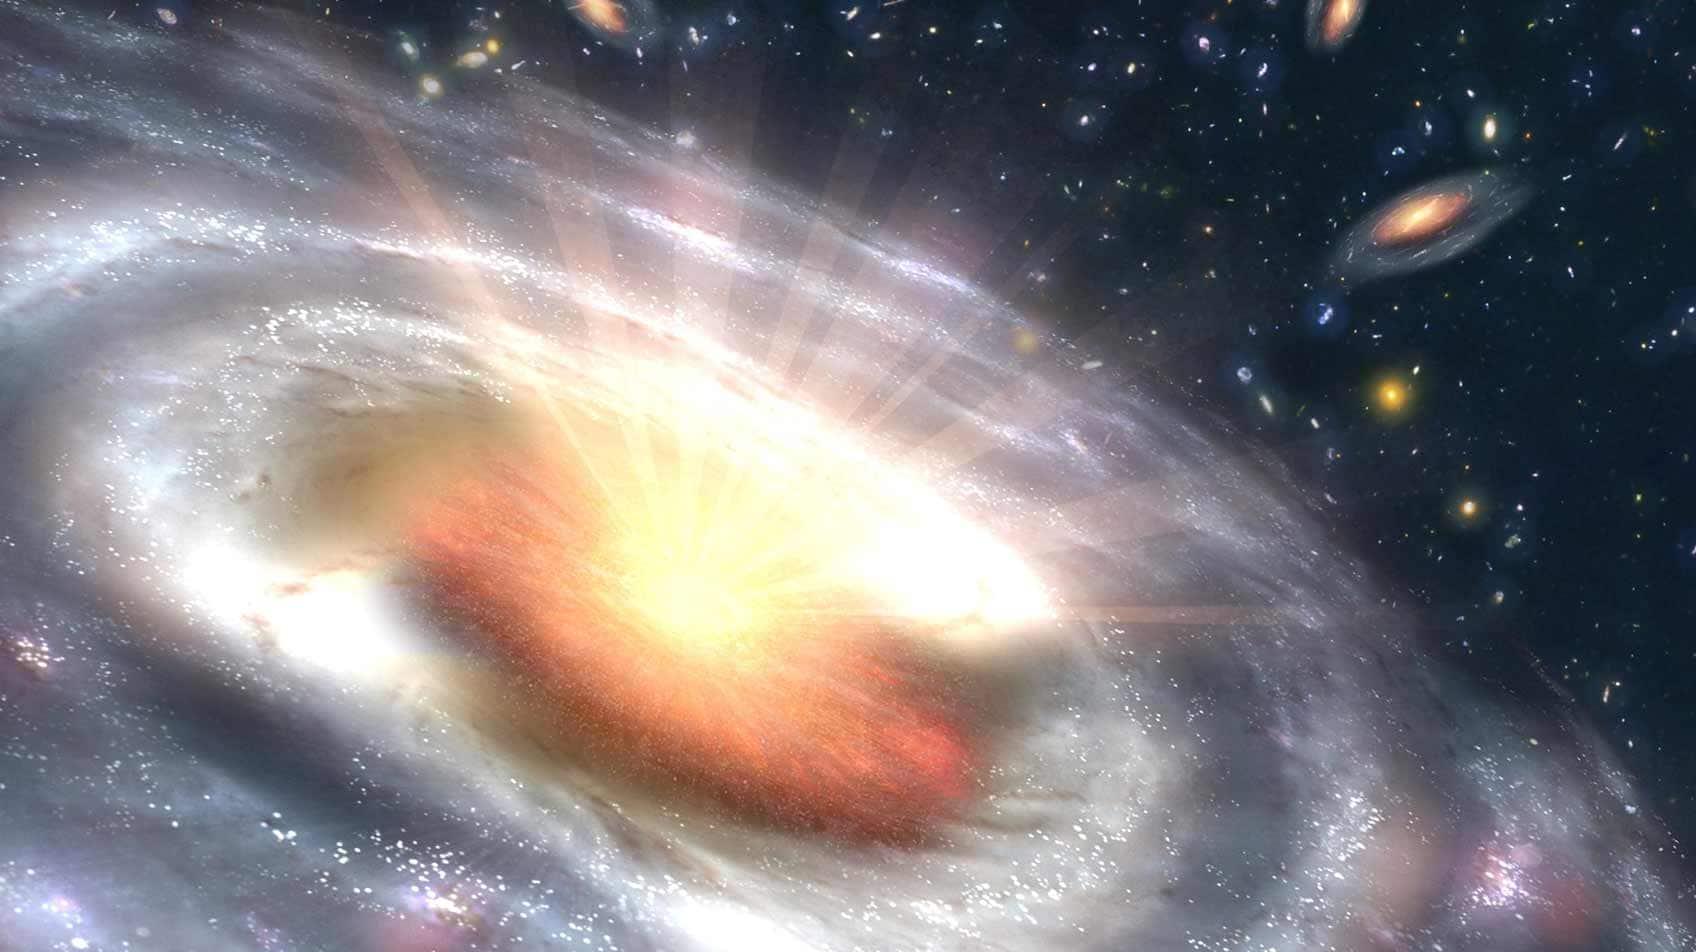 Galactic orgasm theory